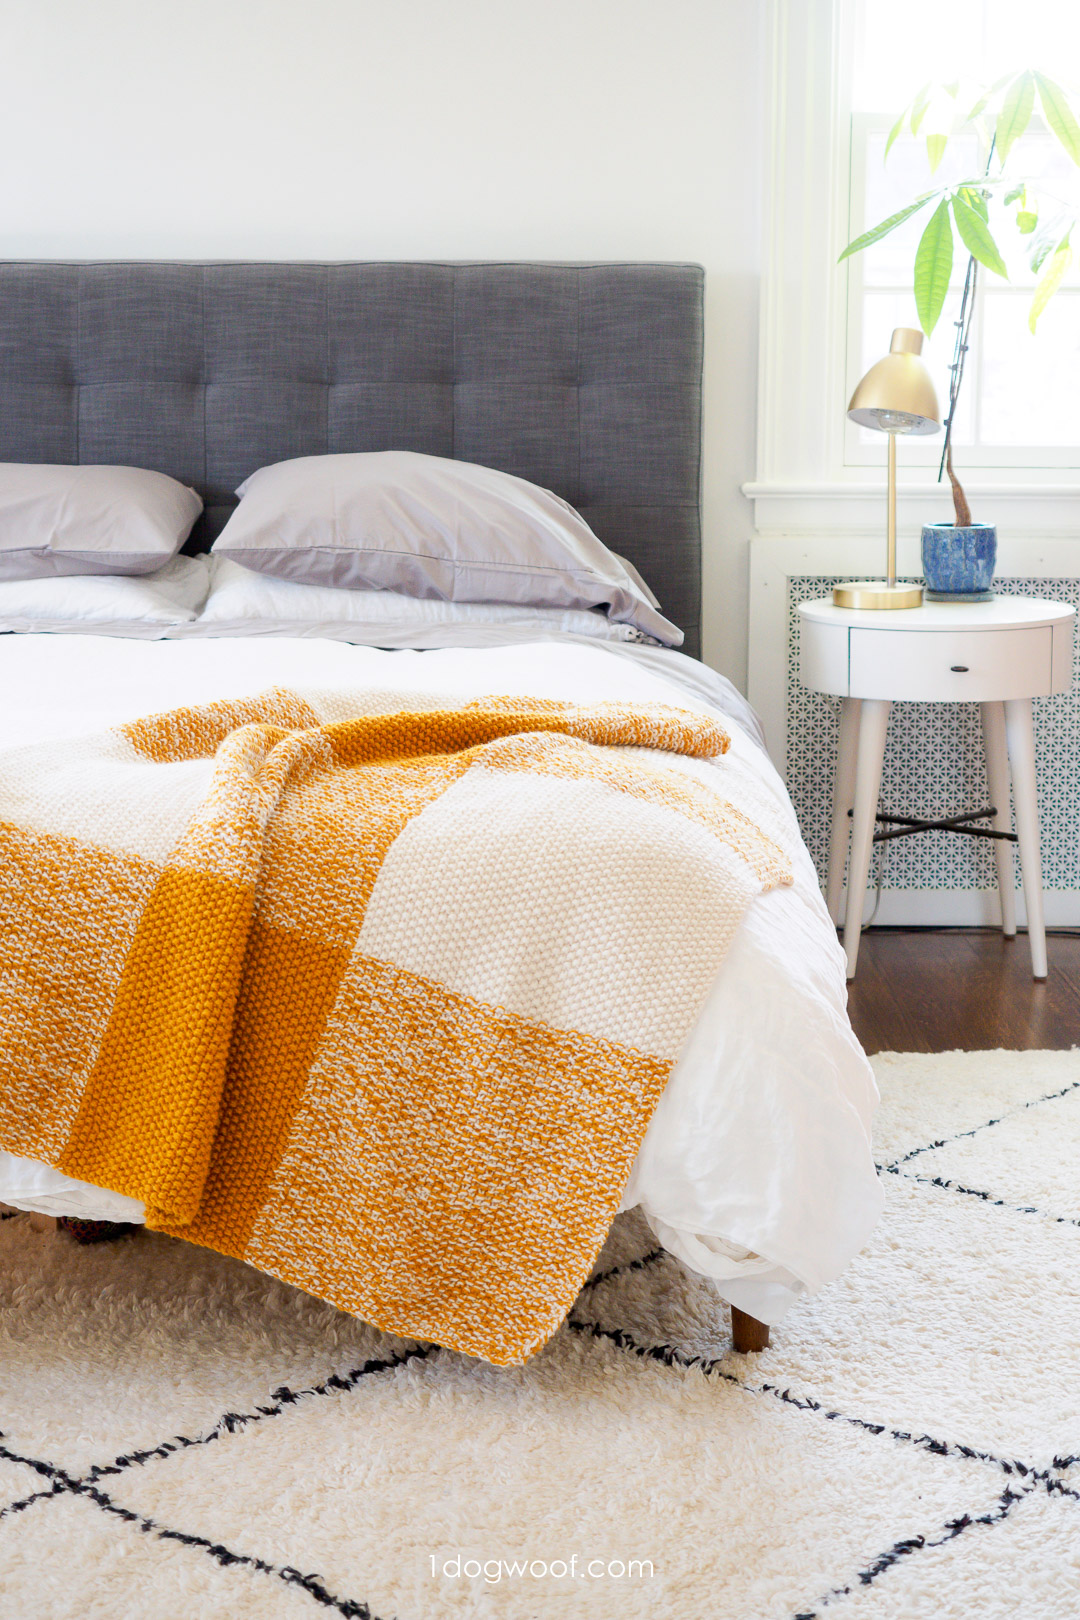 Terra Blanket: A Modern Buffalo Plaid Knitted Blanket